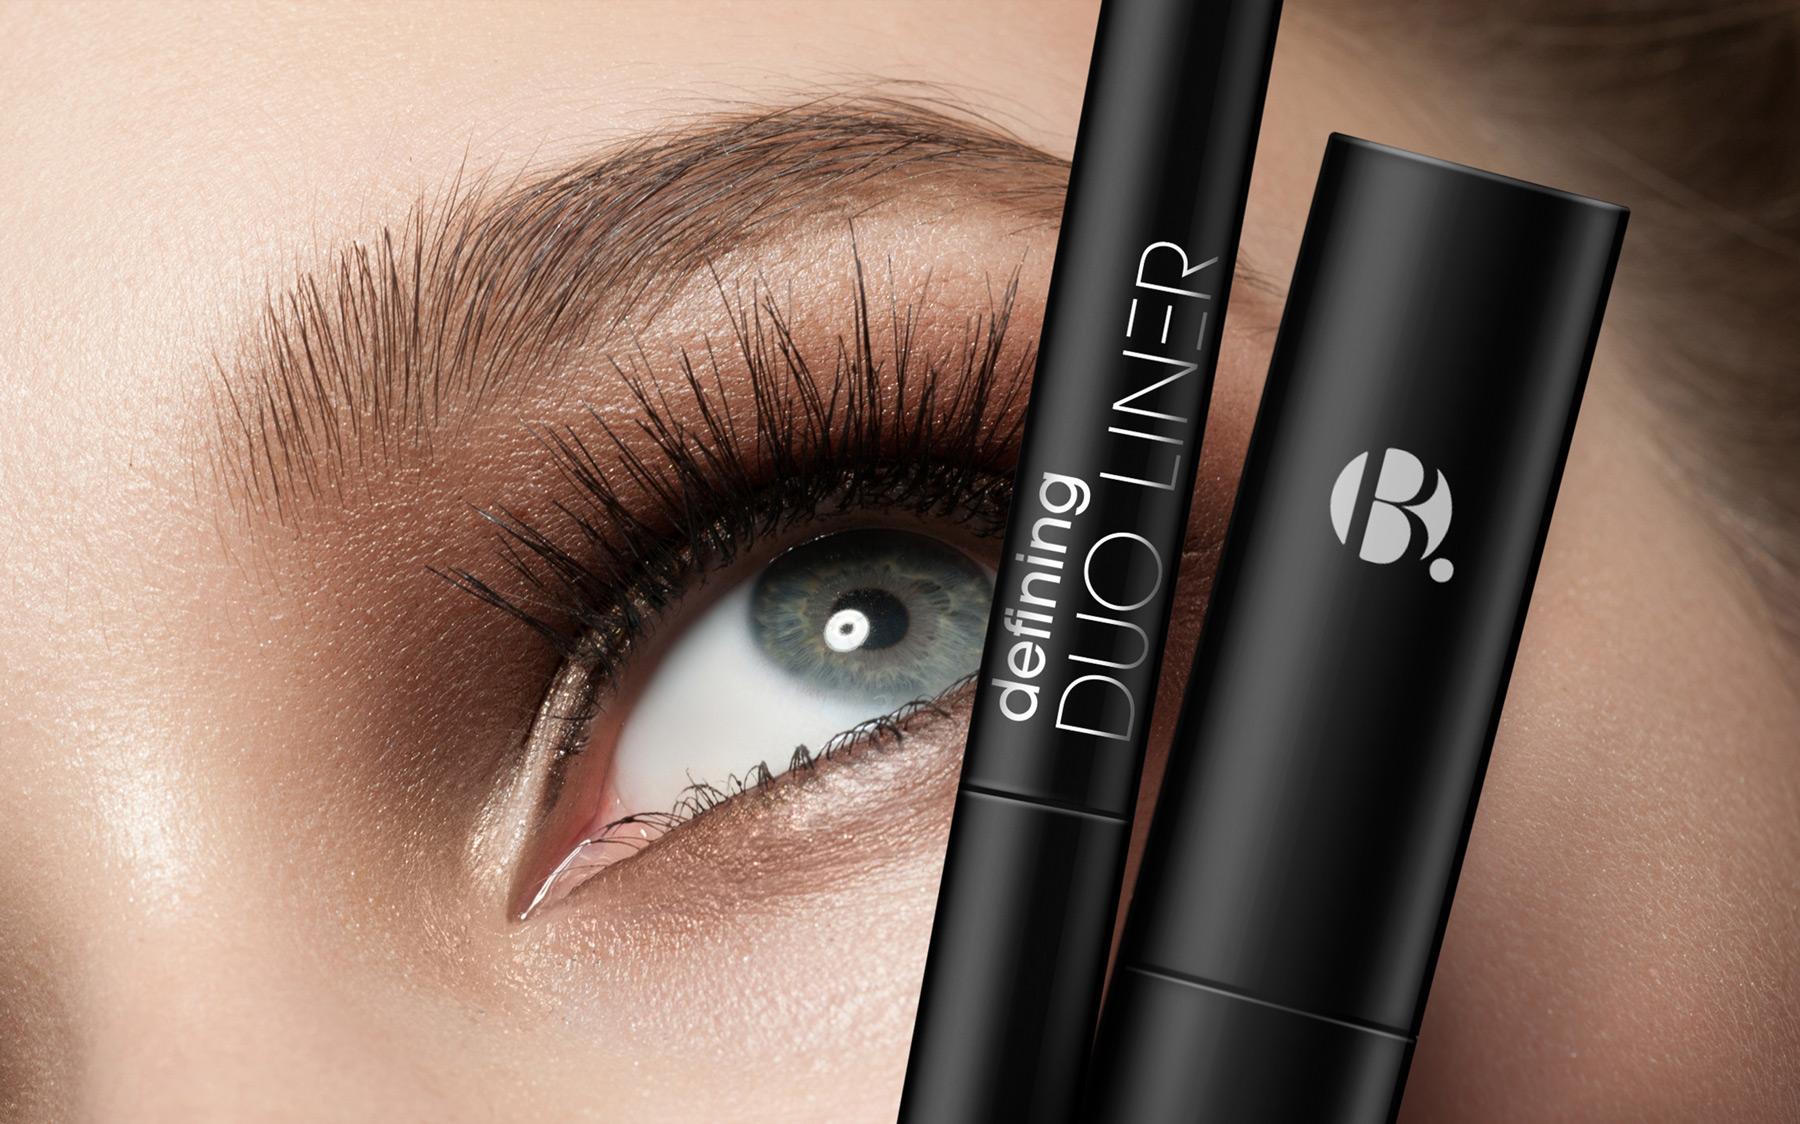 Product shot of beauty branding for Superdrug